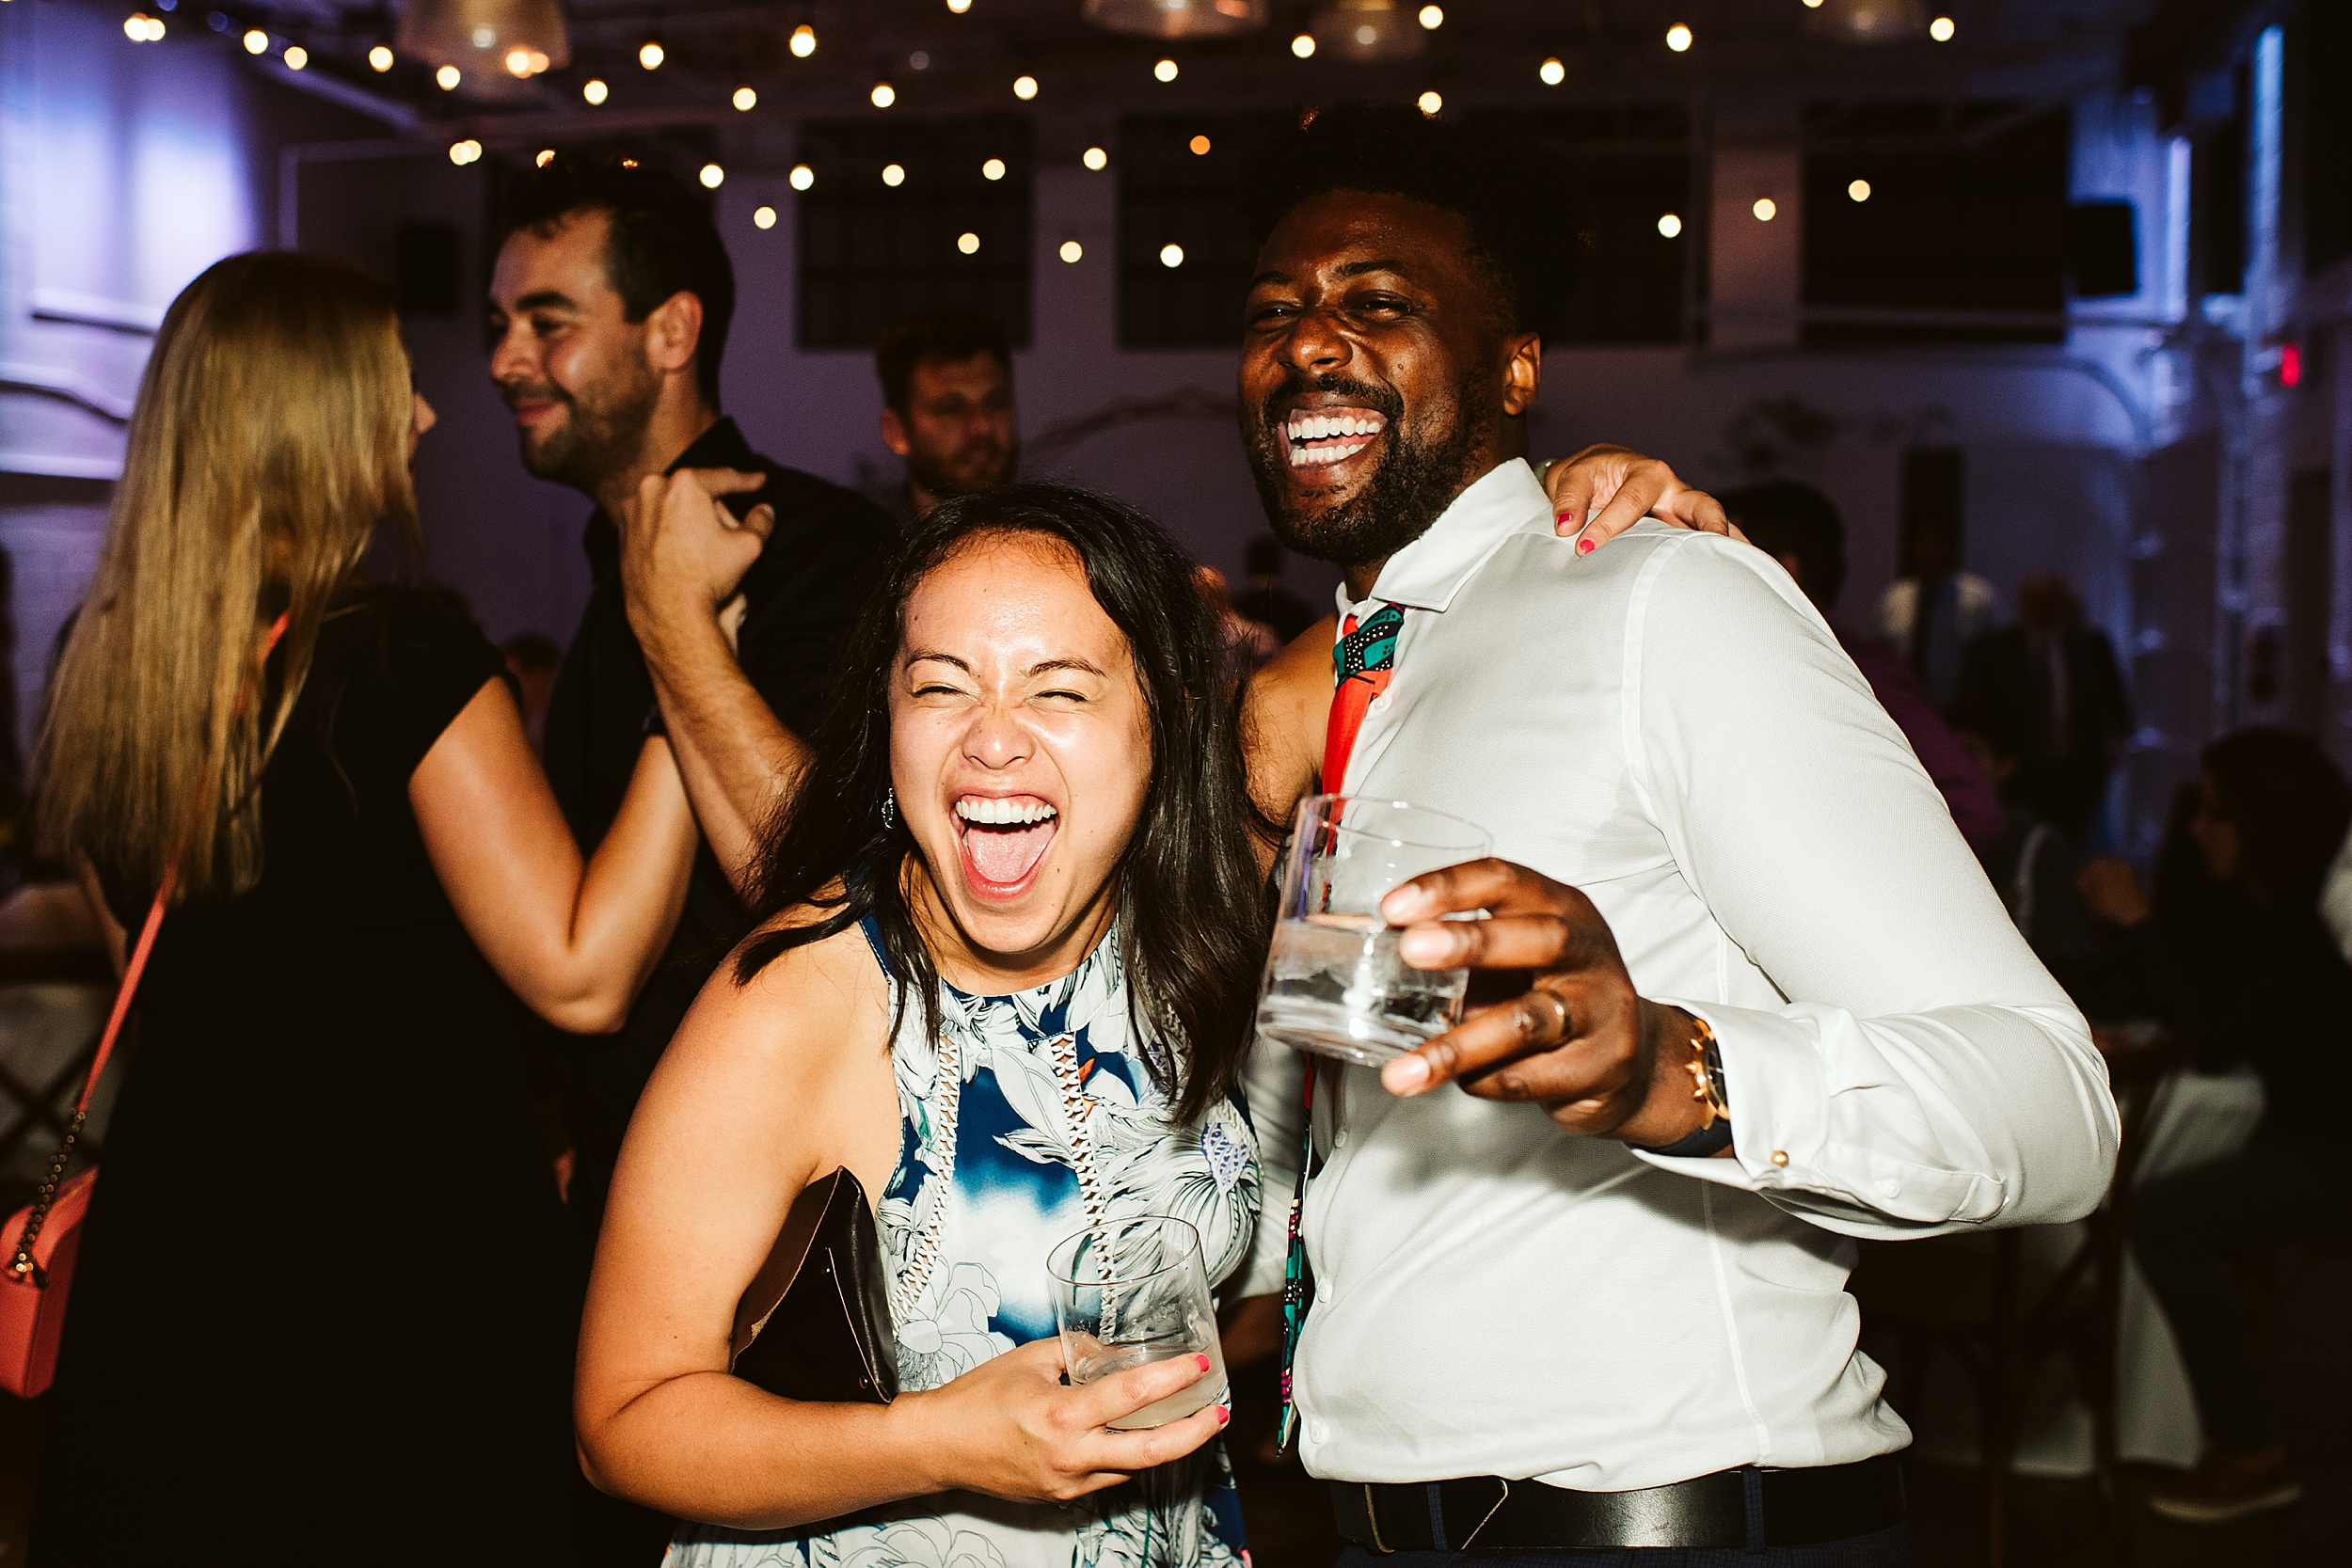 Airship-37-Berkeley-Events-Distillery-District-Wedding-Toronto-Wedding-Photographers_0100.jpg